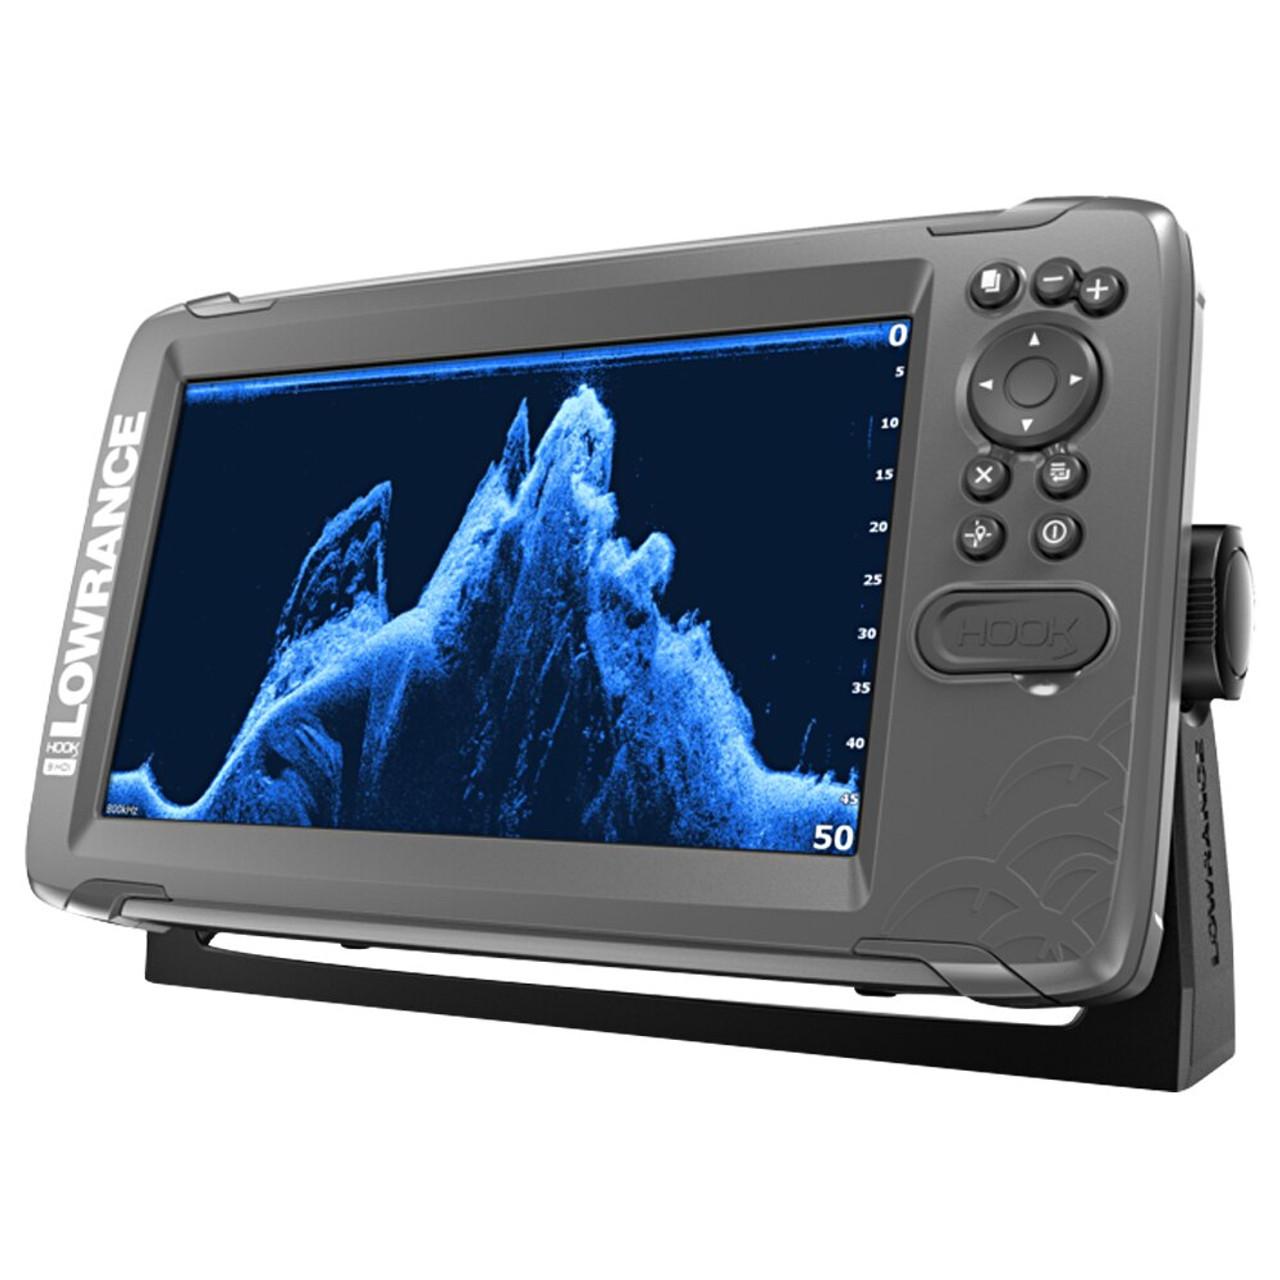 Lowrance HOOK2 9 Fishfinder with SplitShot Transducer & Coastal Maps